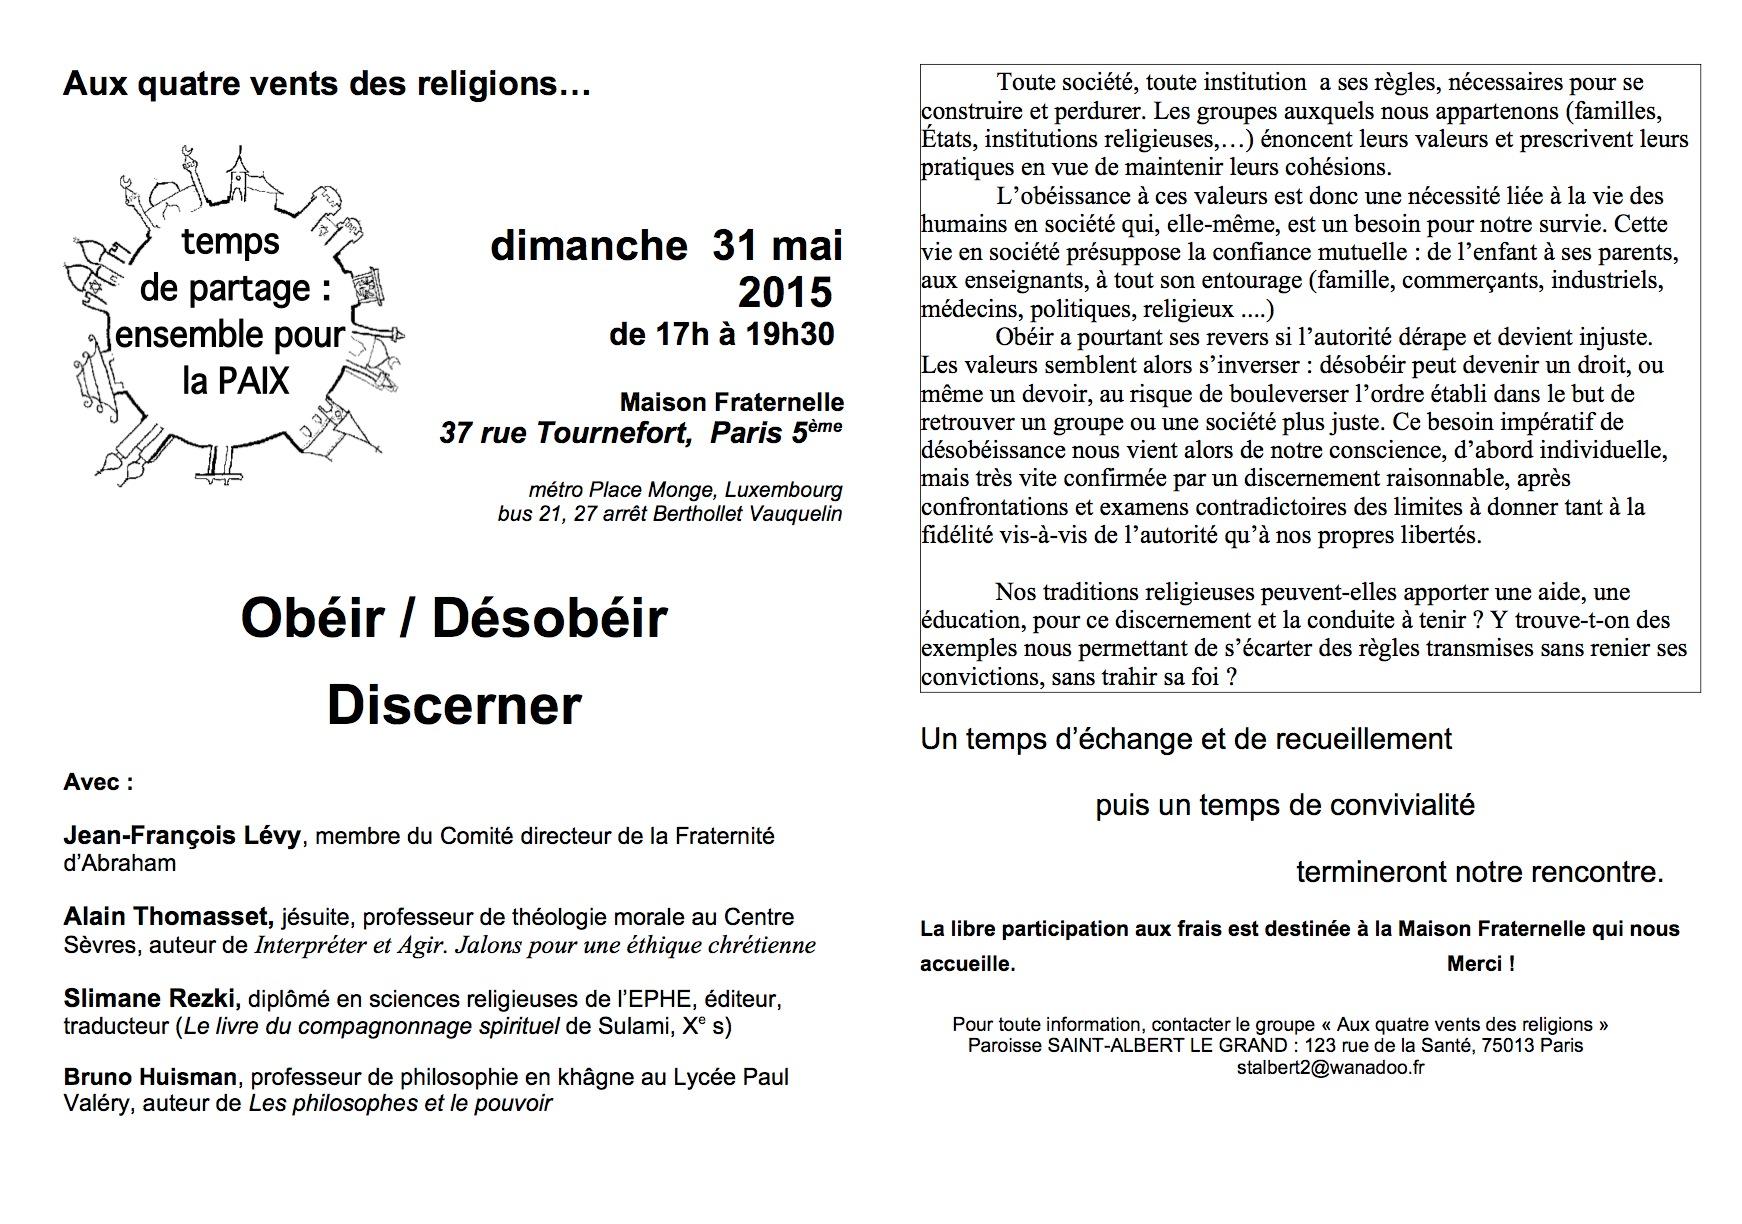 OBEIR DESOBEIR DISCERNER 31 MAI 17H MAISON FRATERNELLE